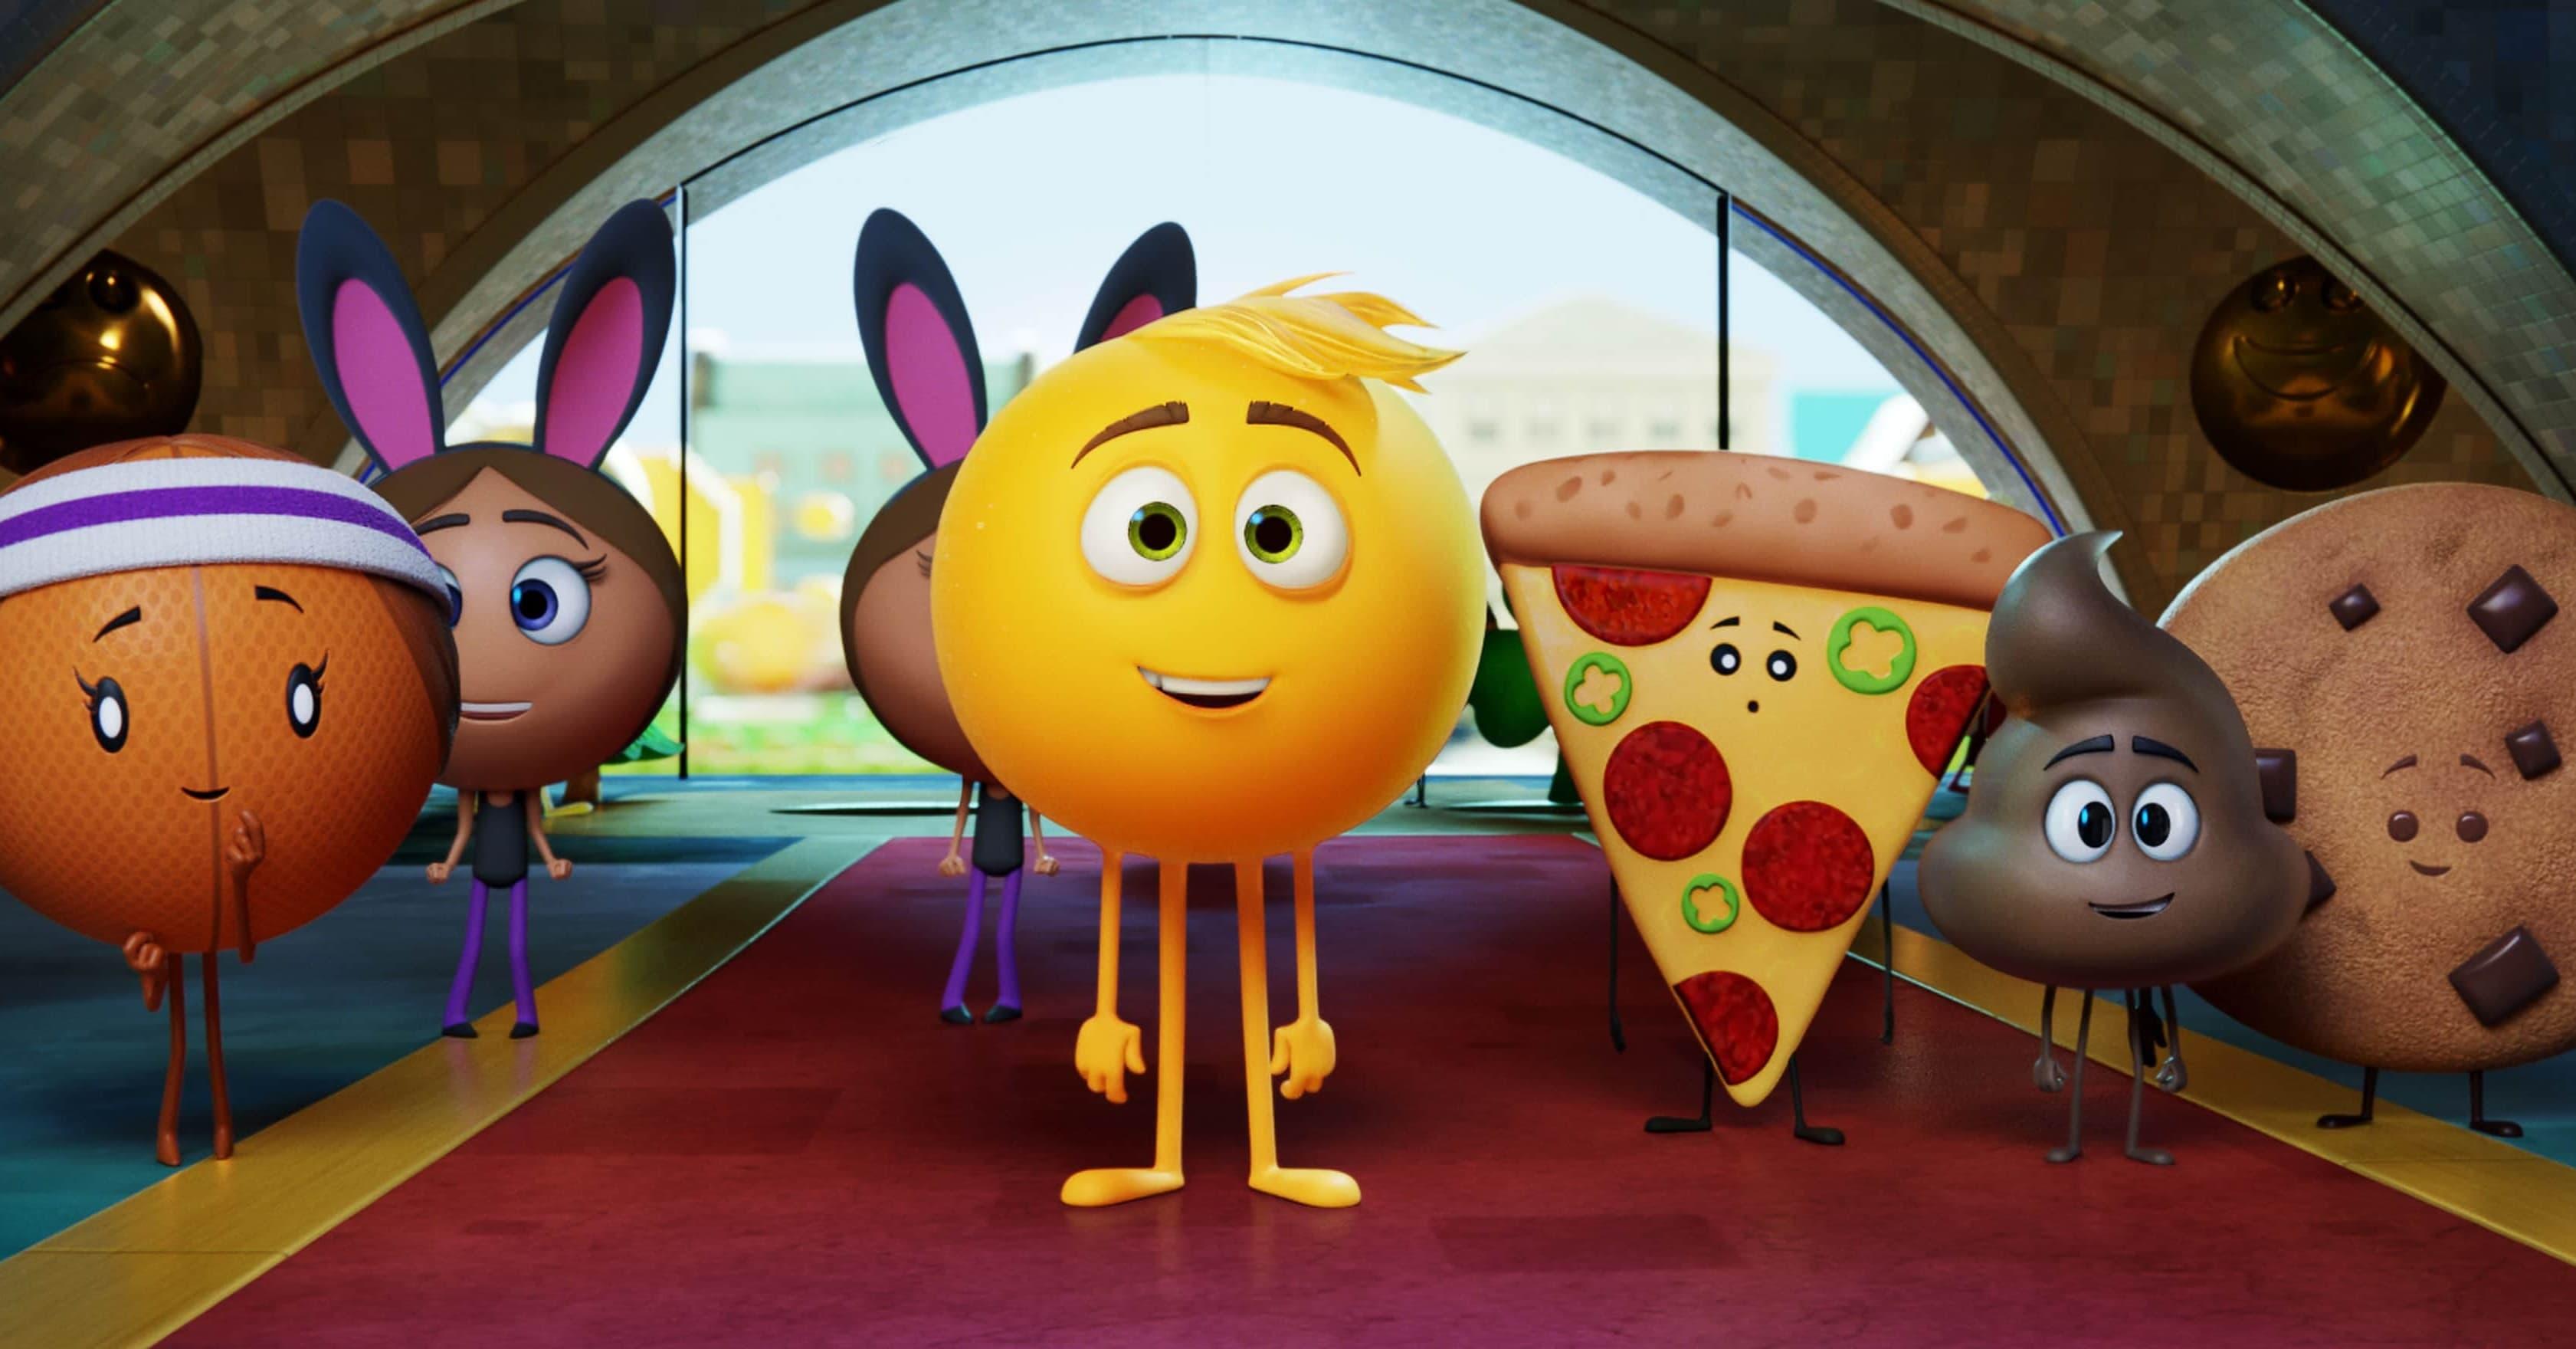 Emoji movie in cinemas